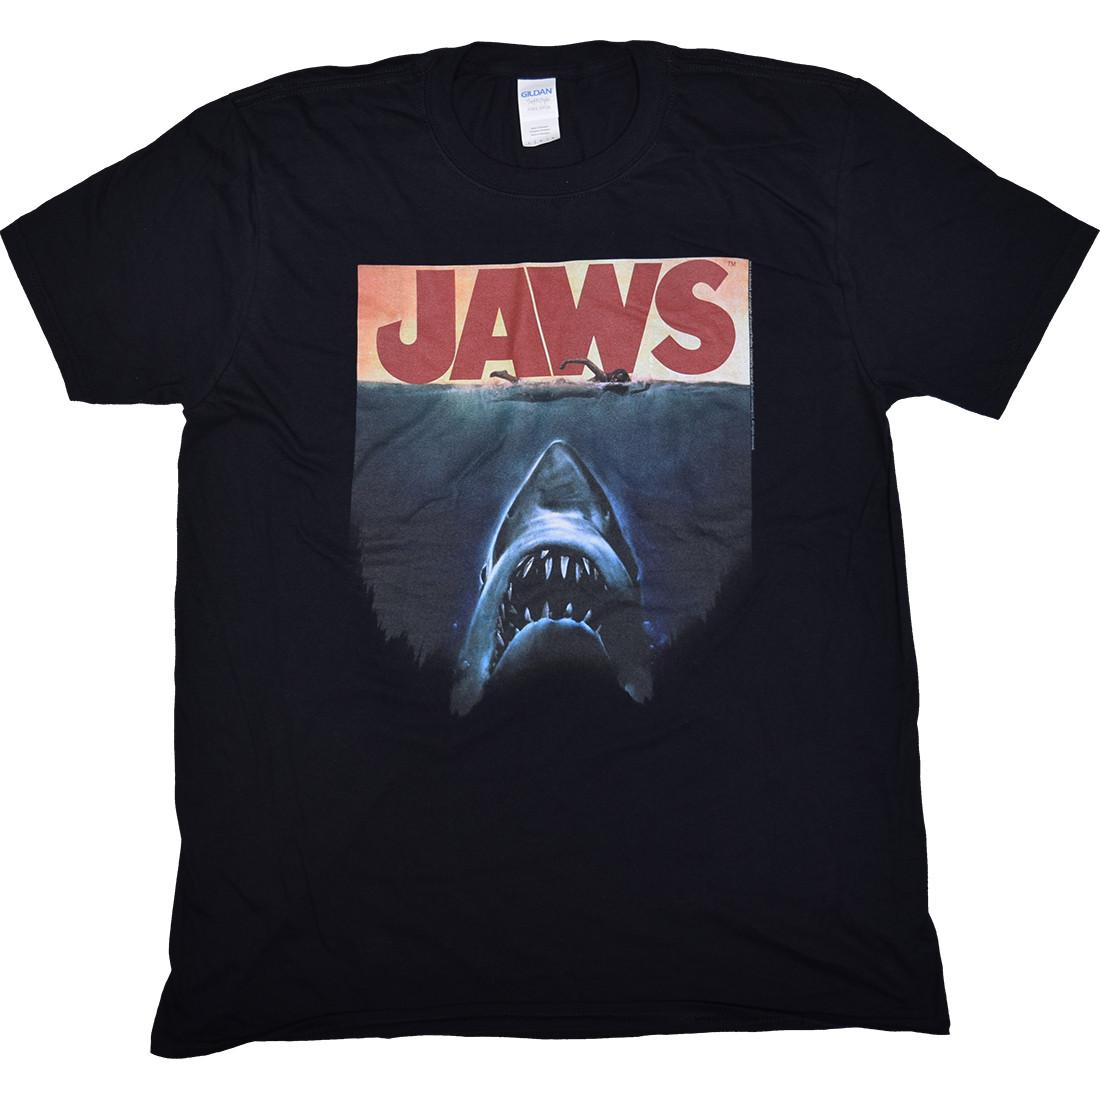 Jaws Poster Again Black T-Shirt